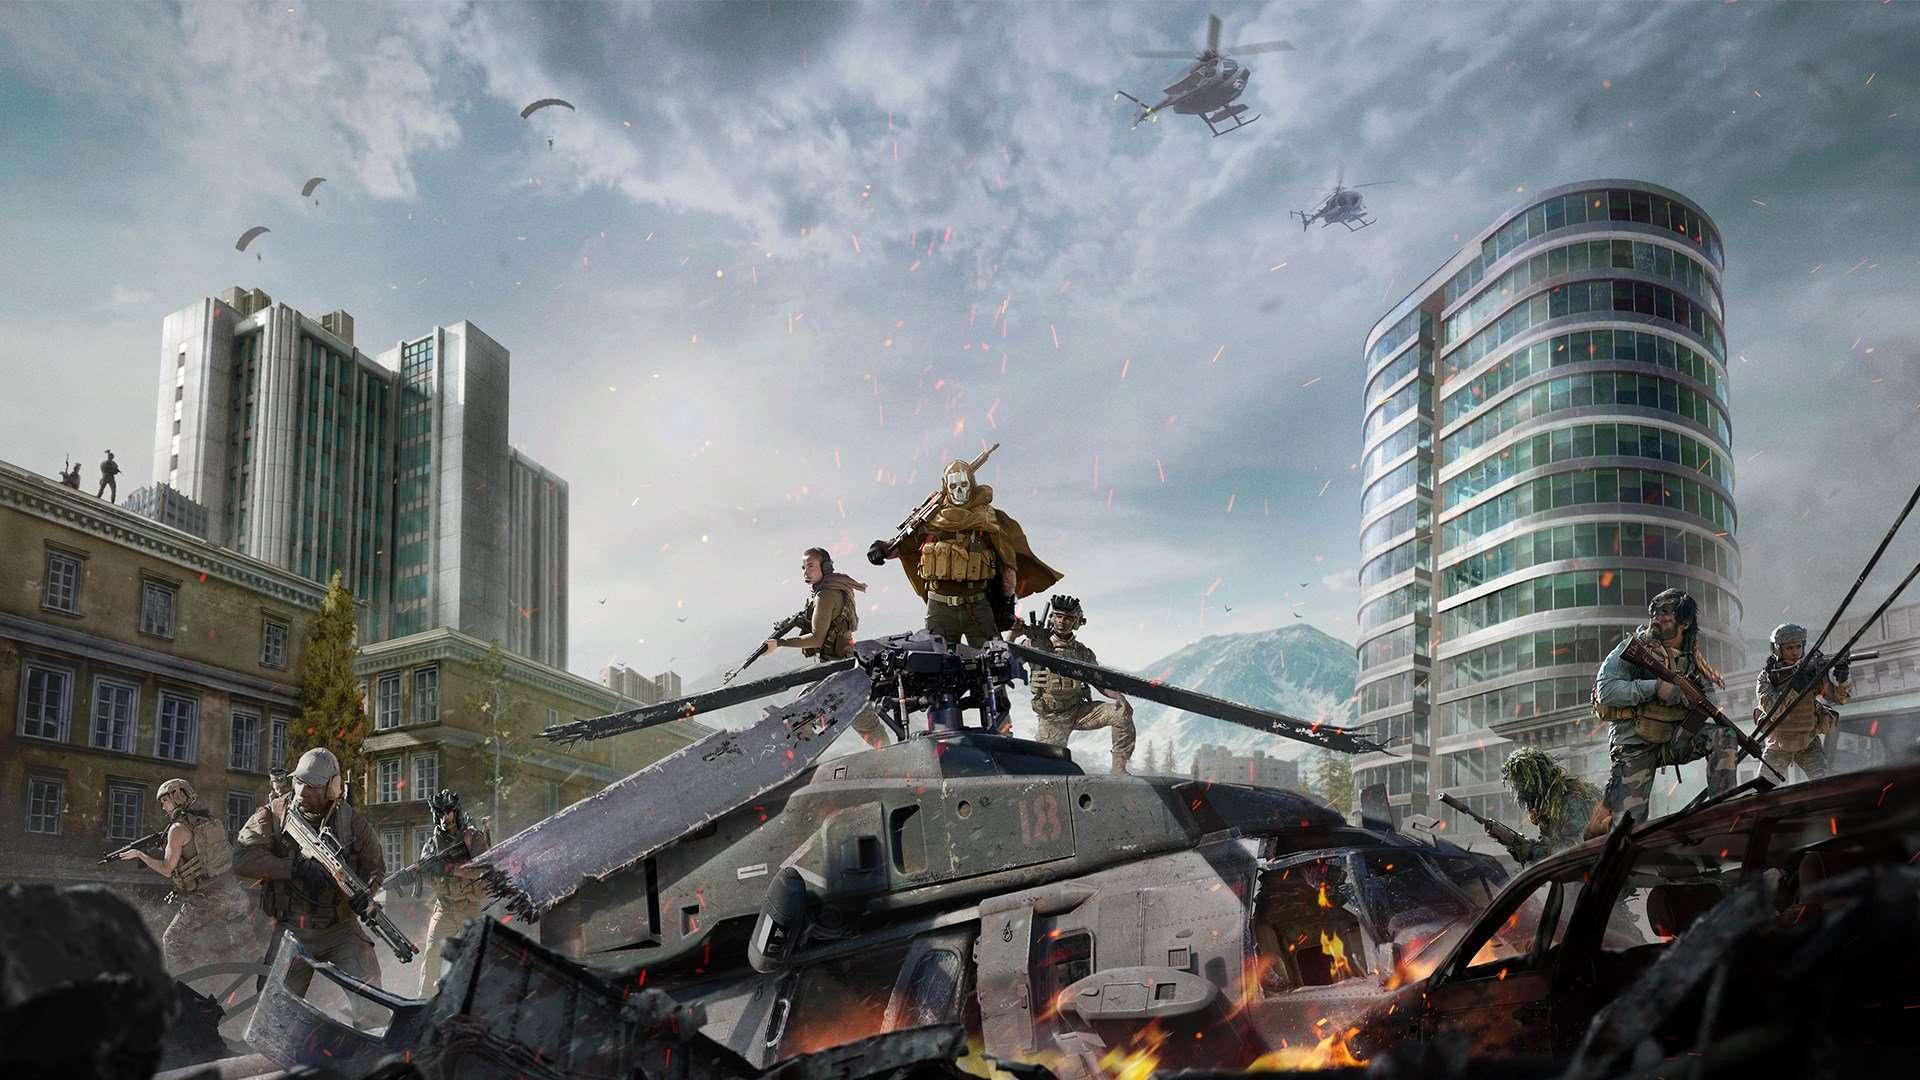 0e9c14002f9268601c57837930261014 - شركة Activision تحظر 60 ألف حساب في لعبة Call of Duty Warzone بسبب الغش